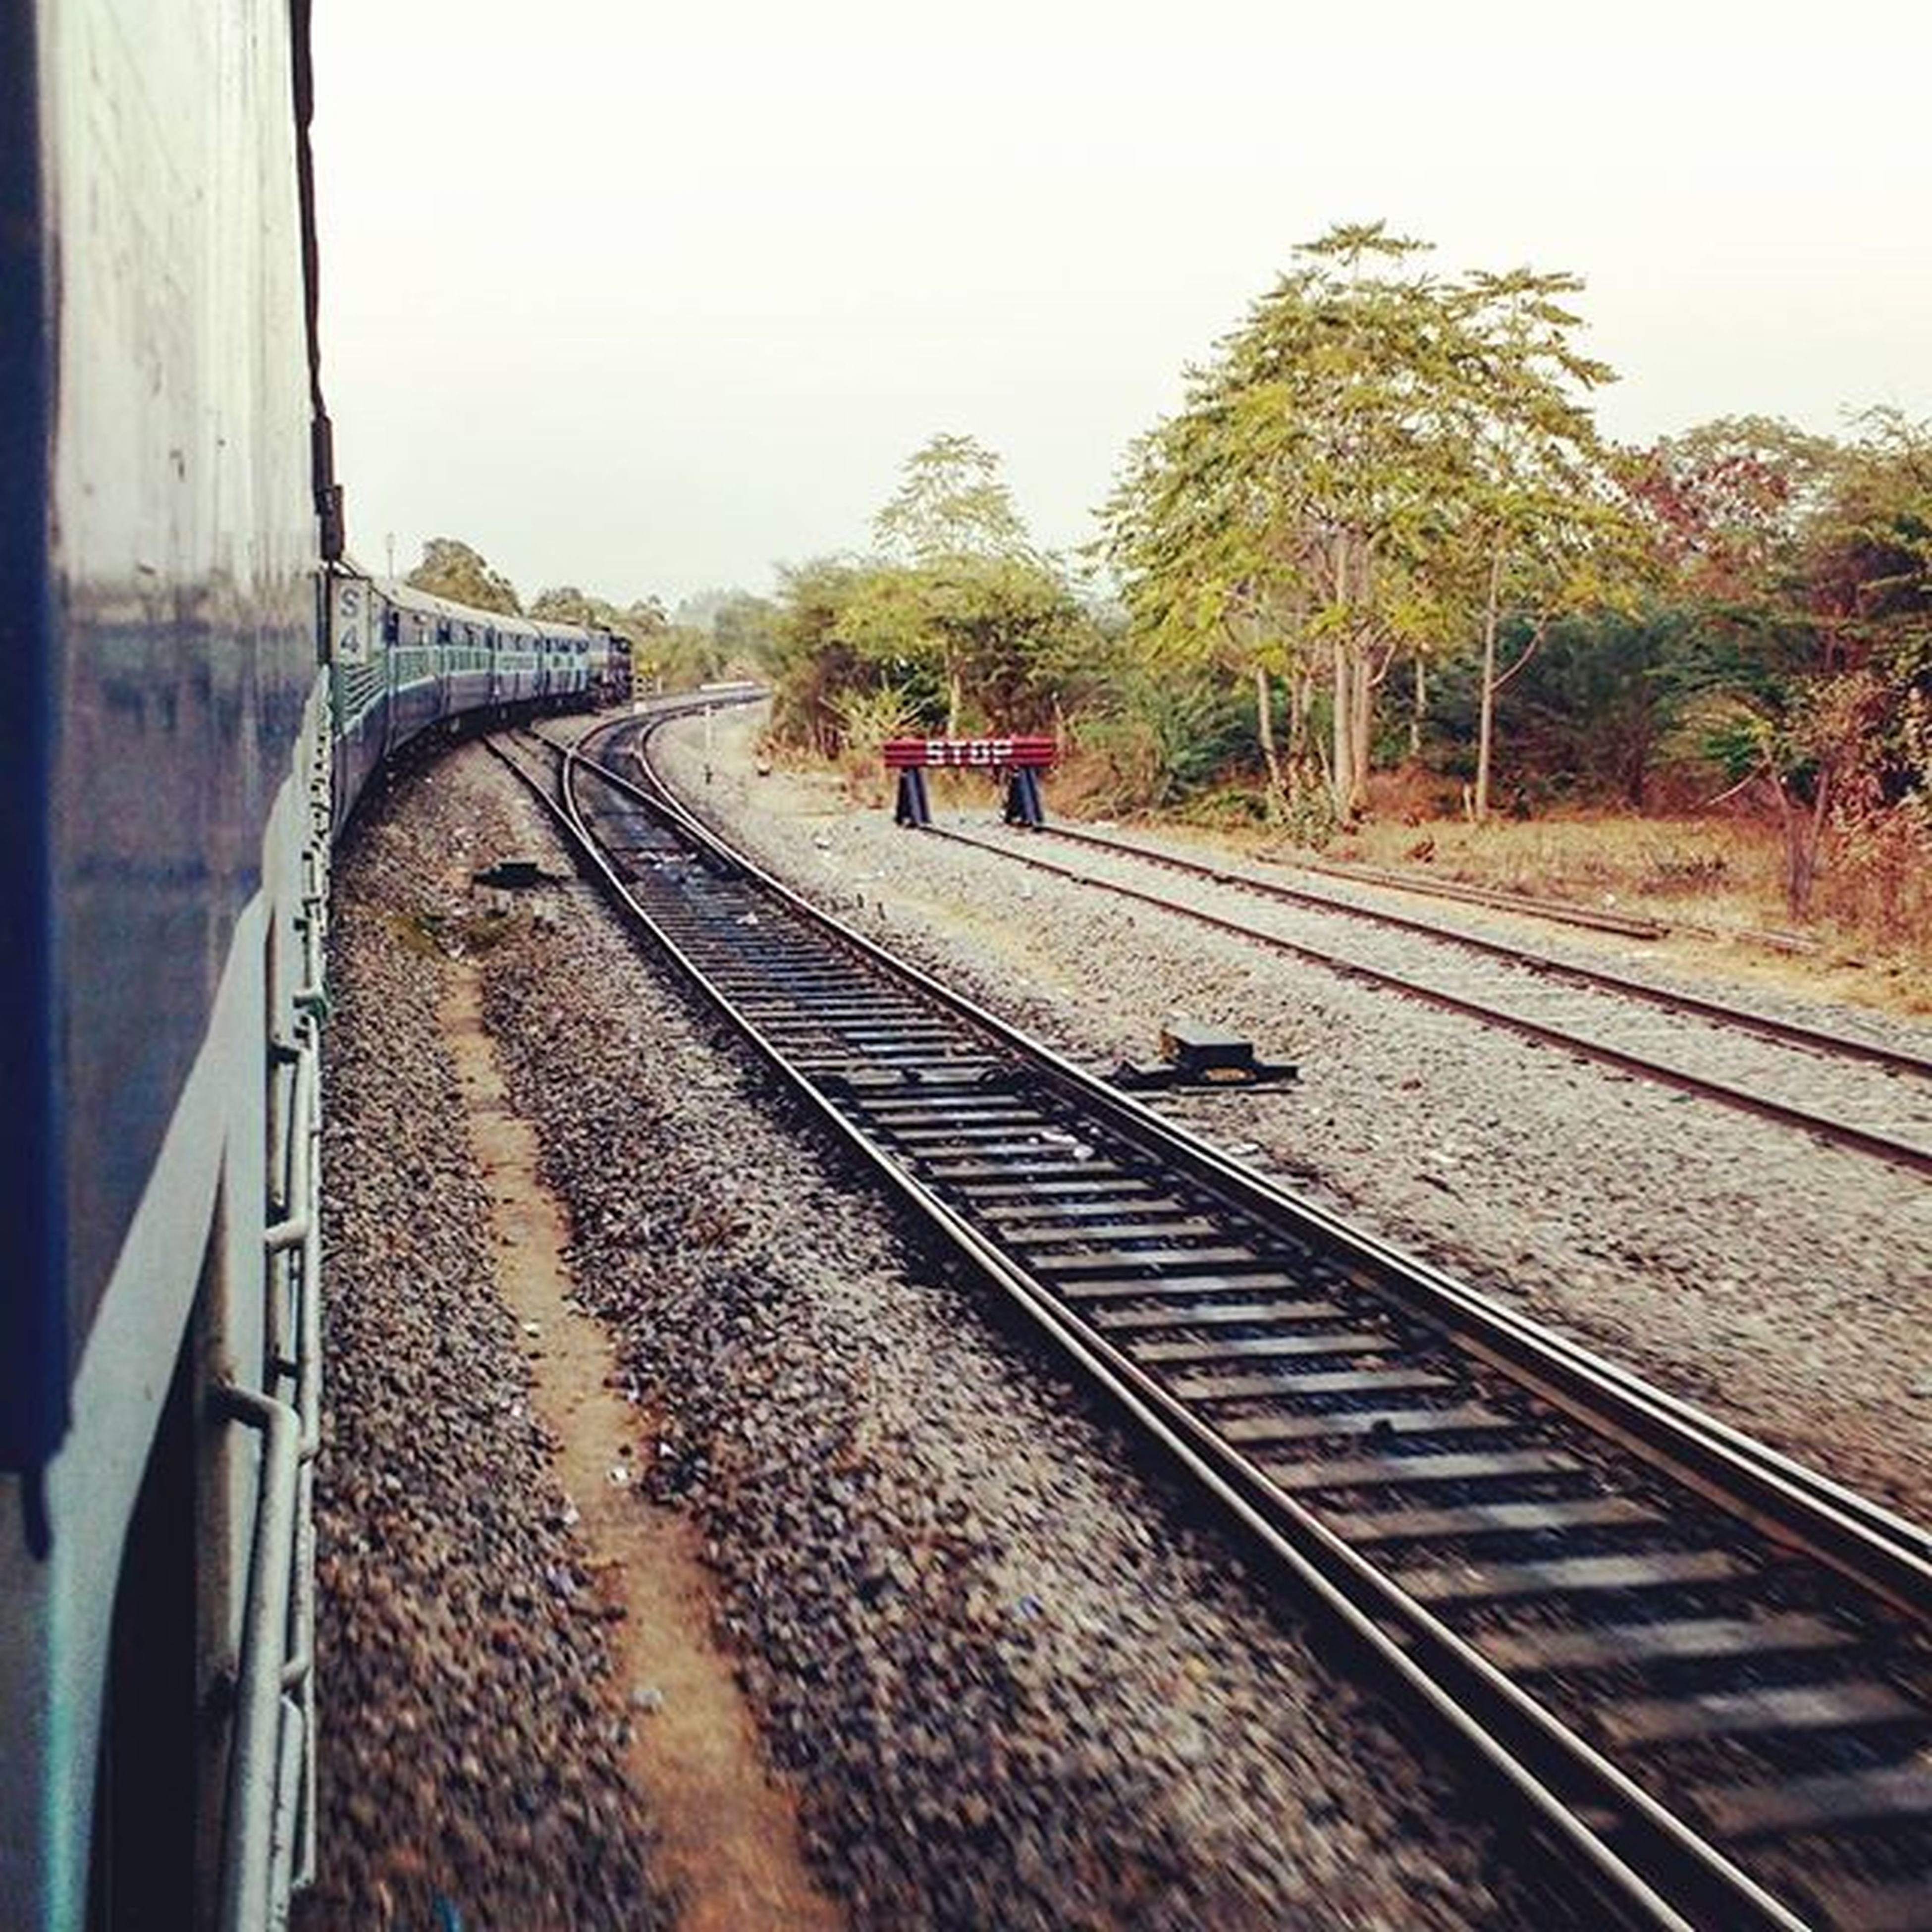 Journey. Trainsofinstagram Indianrailways Mewarexpress Instagramers Instalike Igers Igindia IGDaily Instadaily Instaedit Instapic POTD Picoftheday Vscogram India Indian Picoftheday Travelgram Wanderlust Udaipur Rajasthan